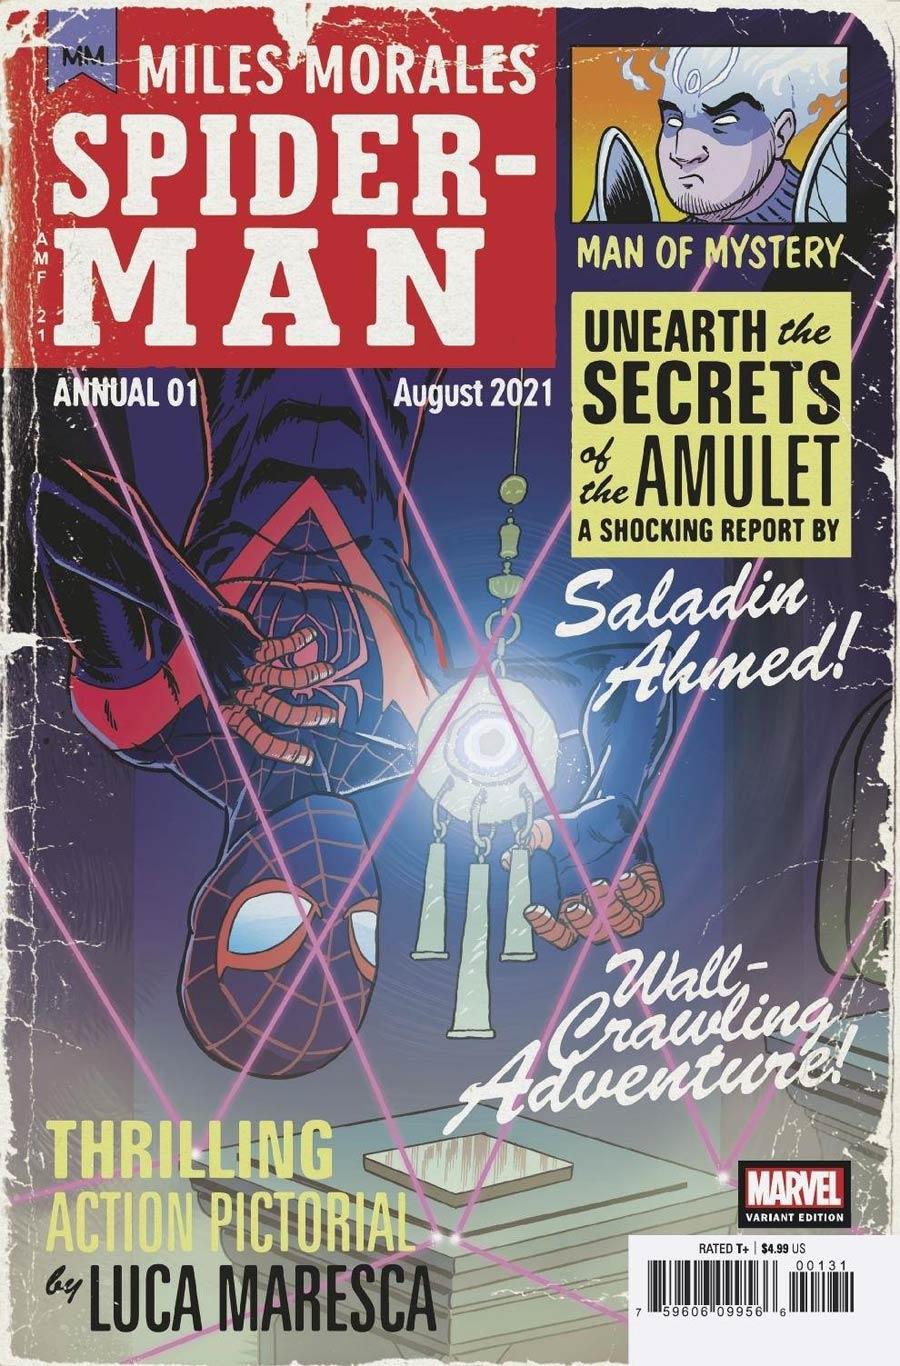 Miles Morales Spider-Man Annual #1 Cover C Incentive Tony Fleecs Variant Cover (Infinite Destinies Tie-In)